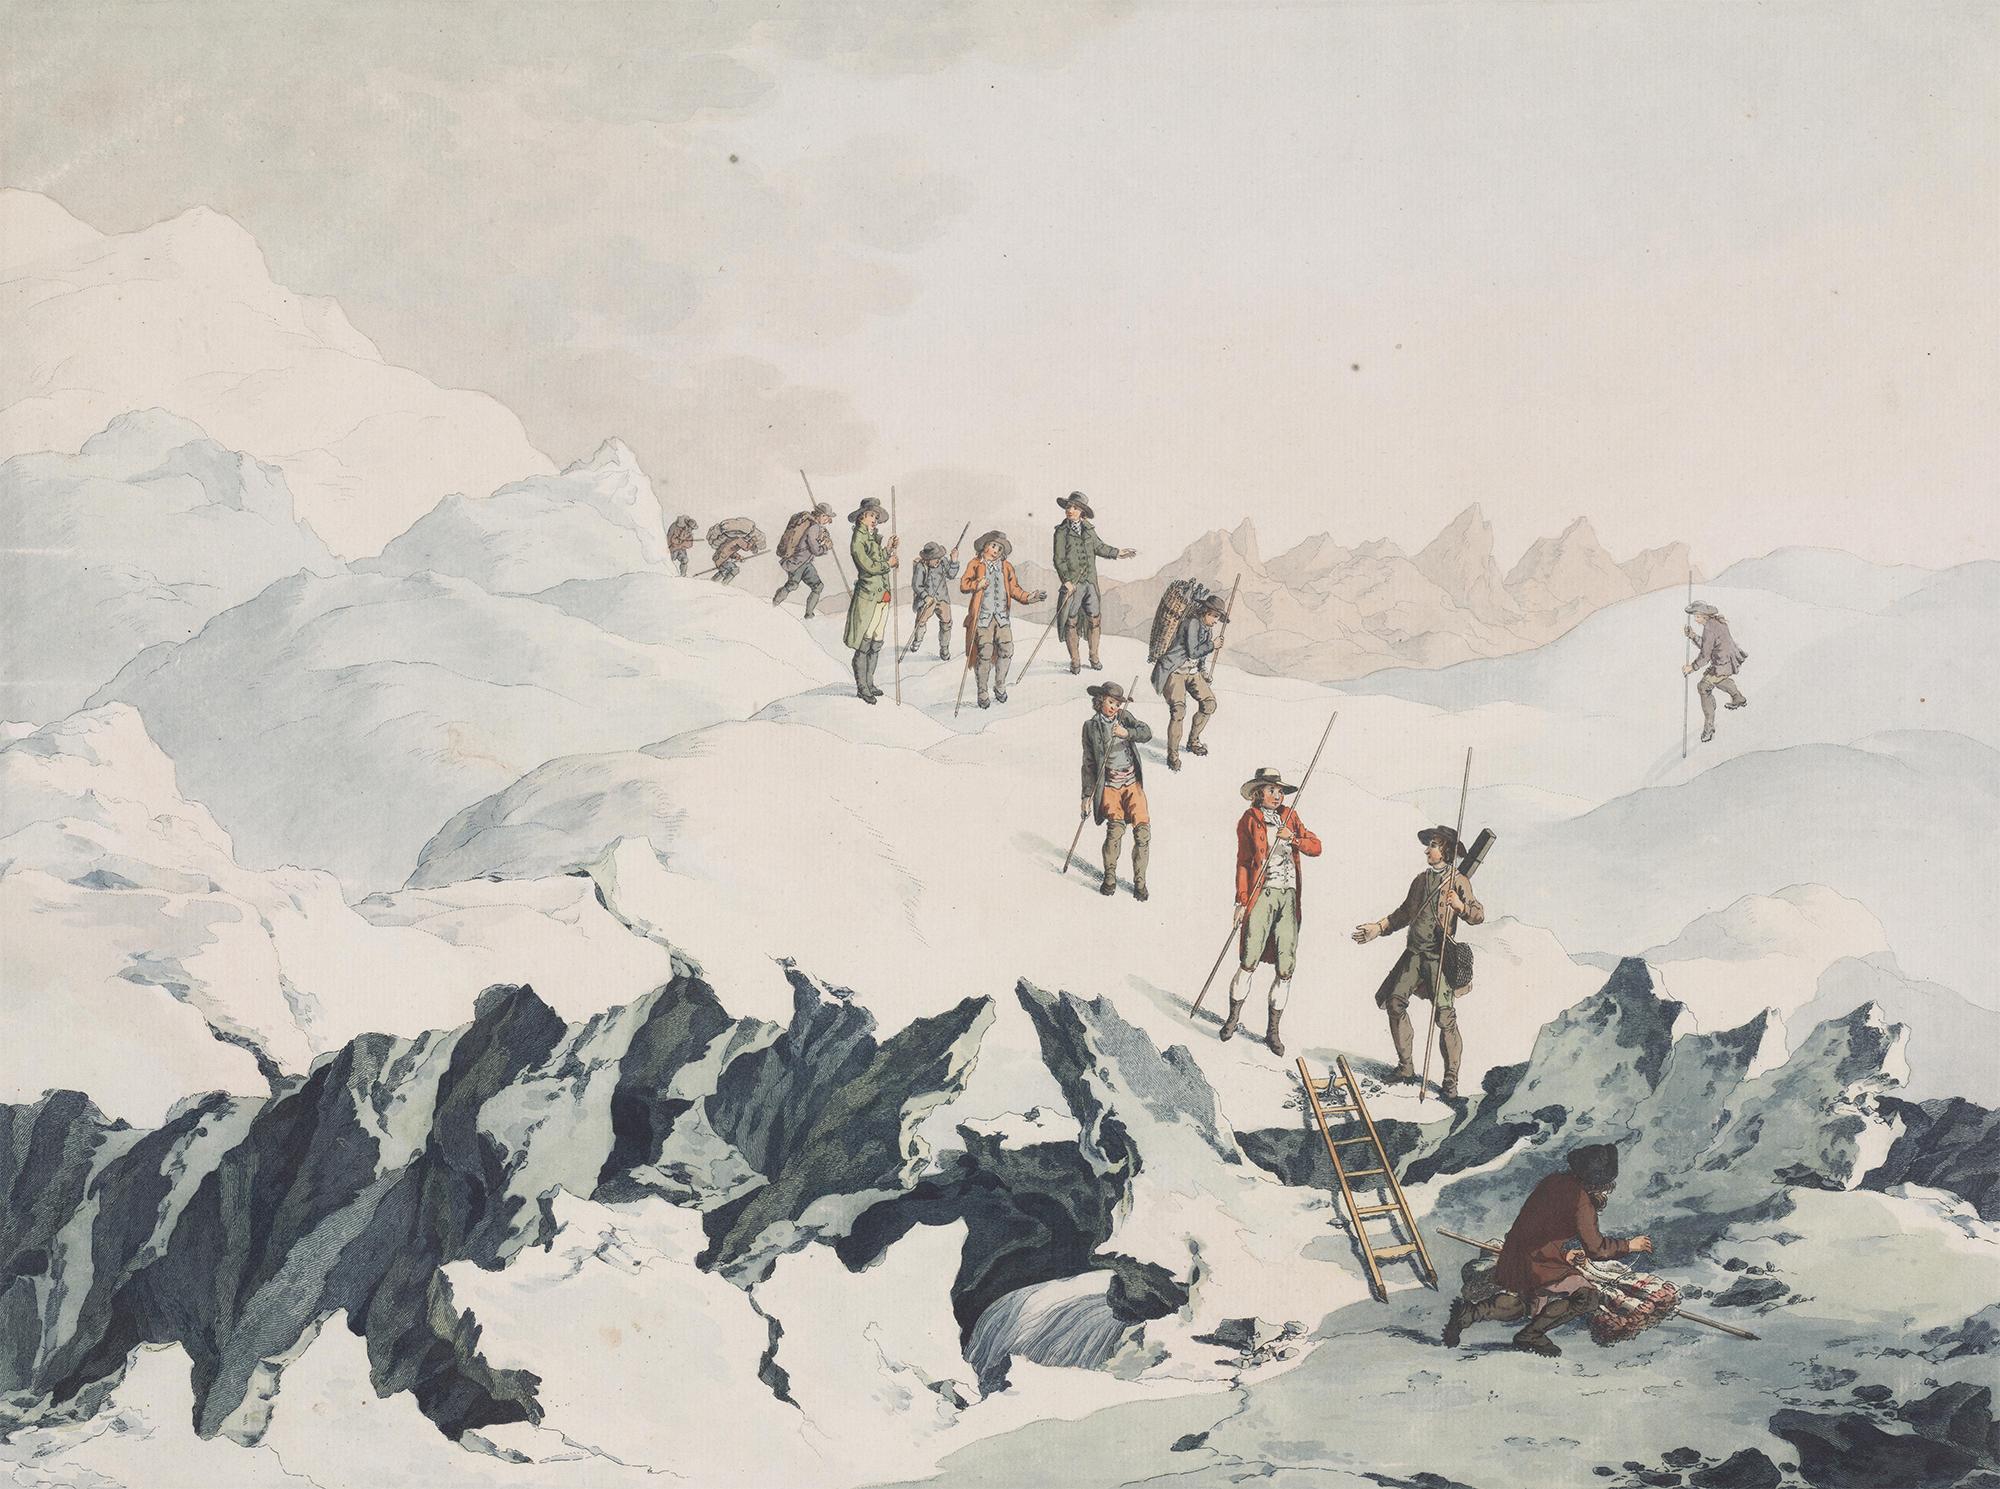 Illustration of the Alpine Climbers |  Christian von Mechel via Wikimedia Commons